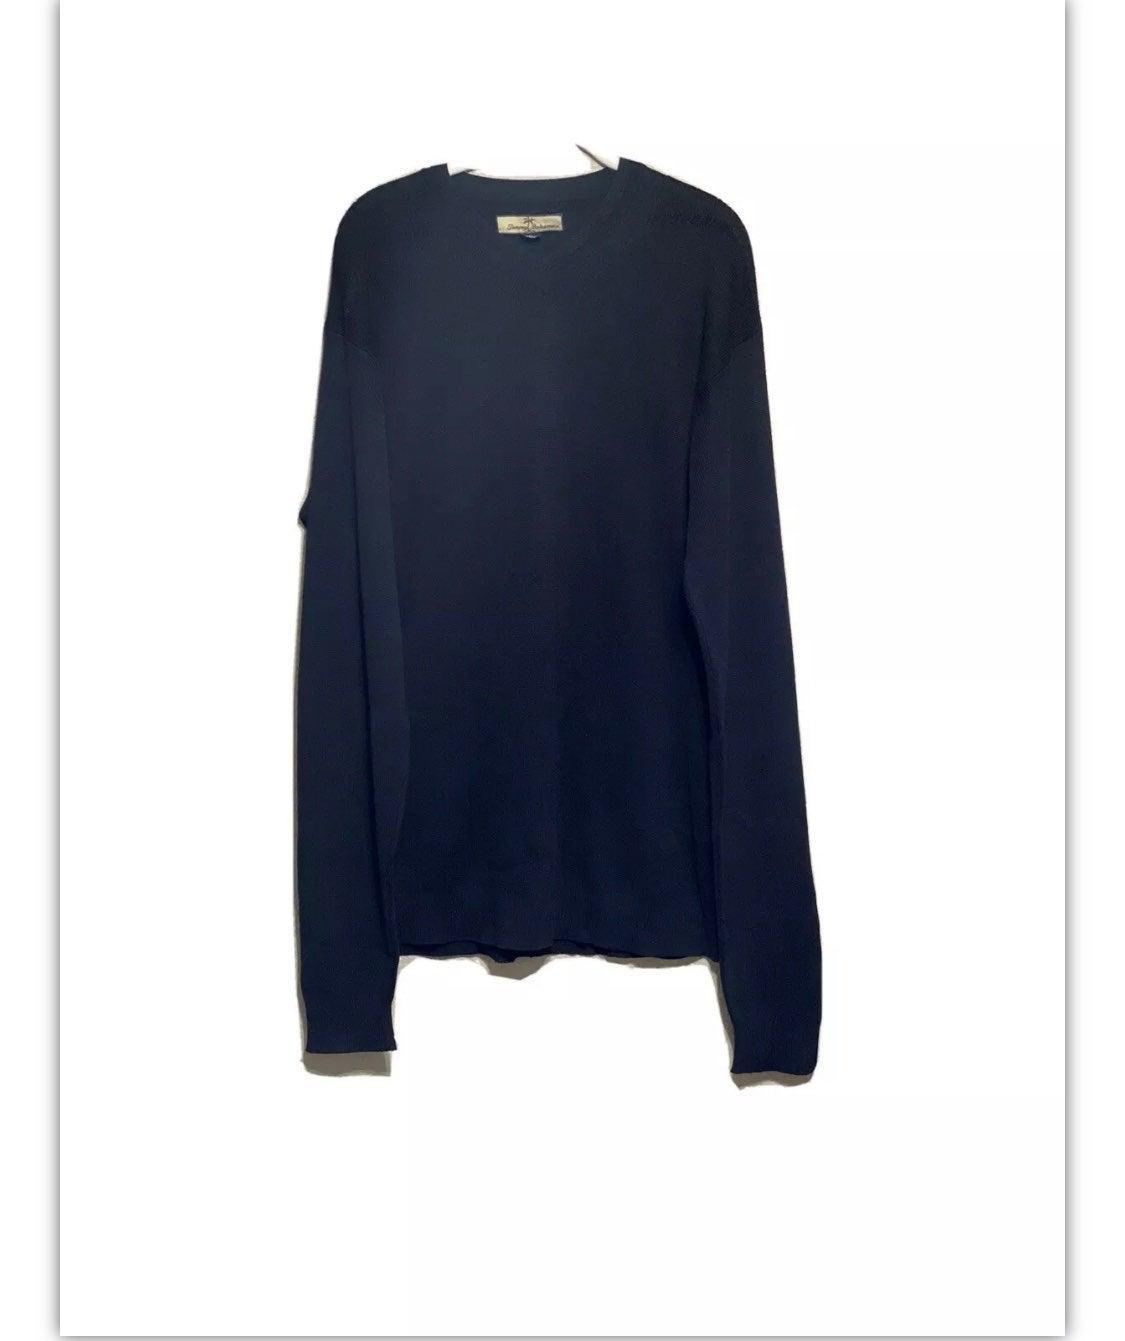 Tommy Bahama Black V-Neck Sweater